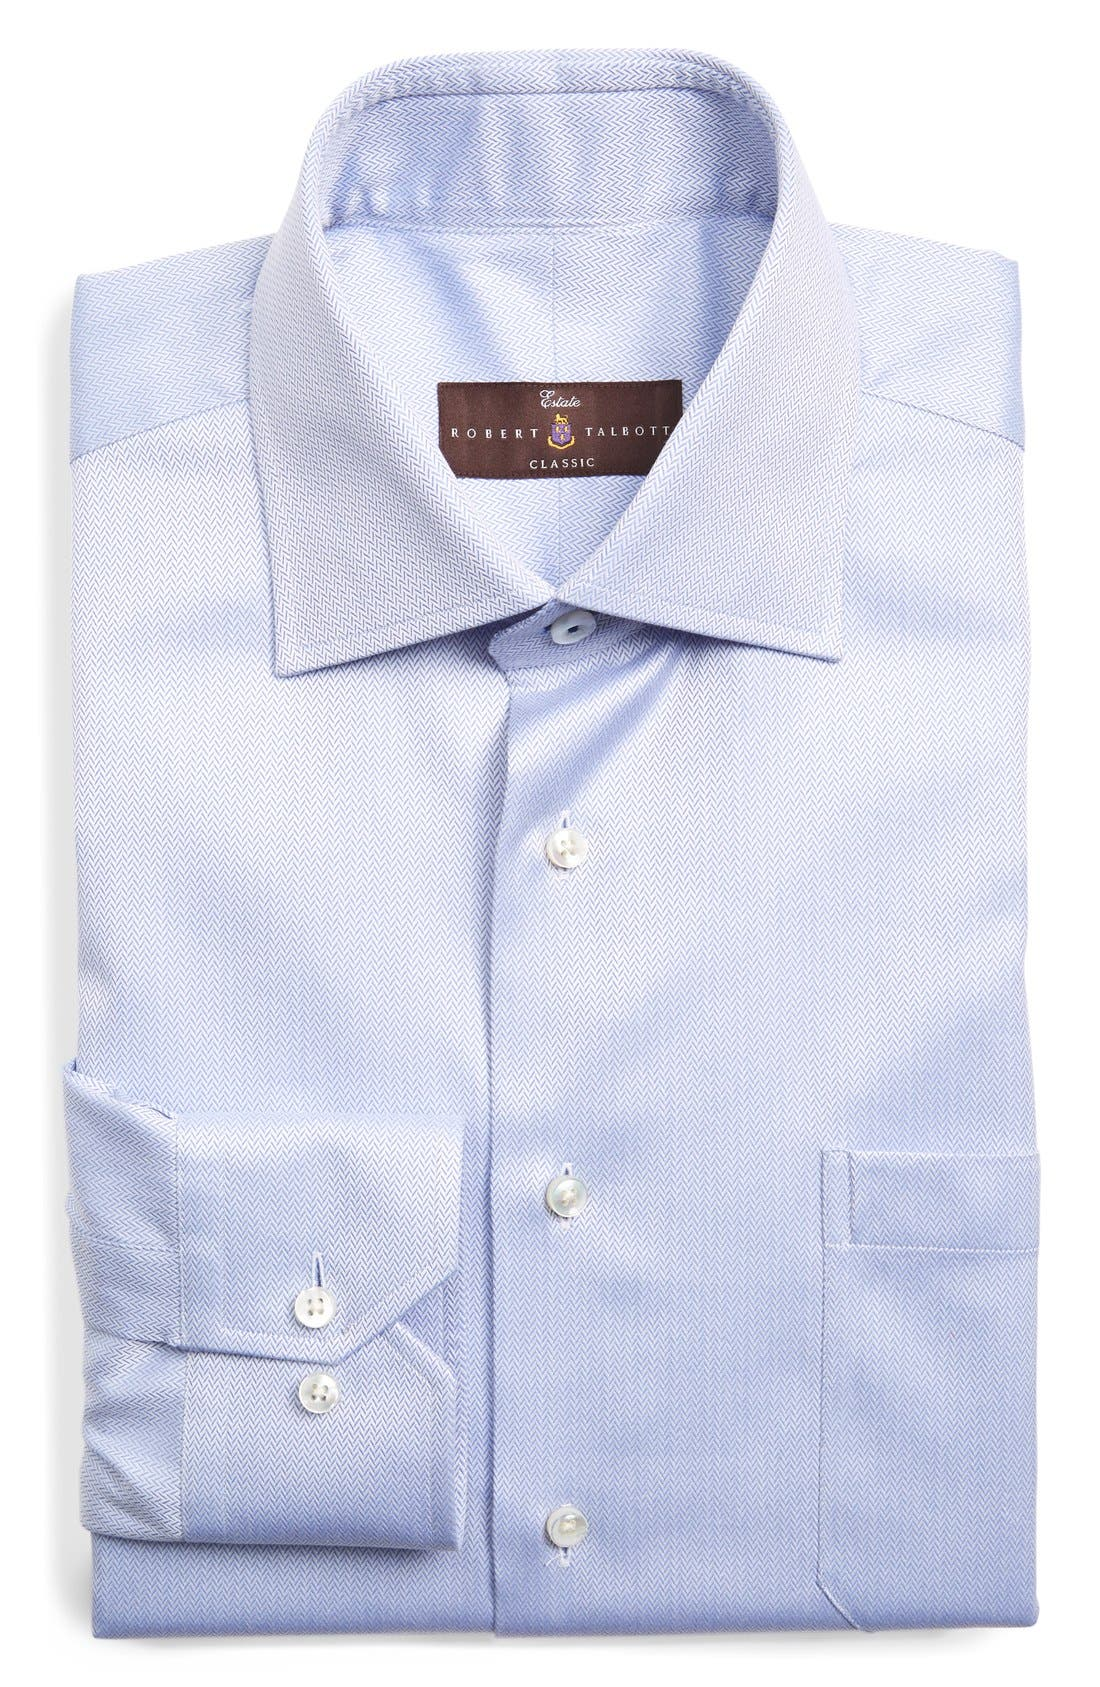 Classic Fit Dress Shirt,                         Main,                         color, Sky